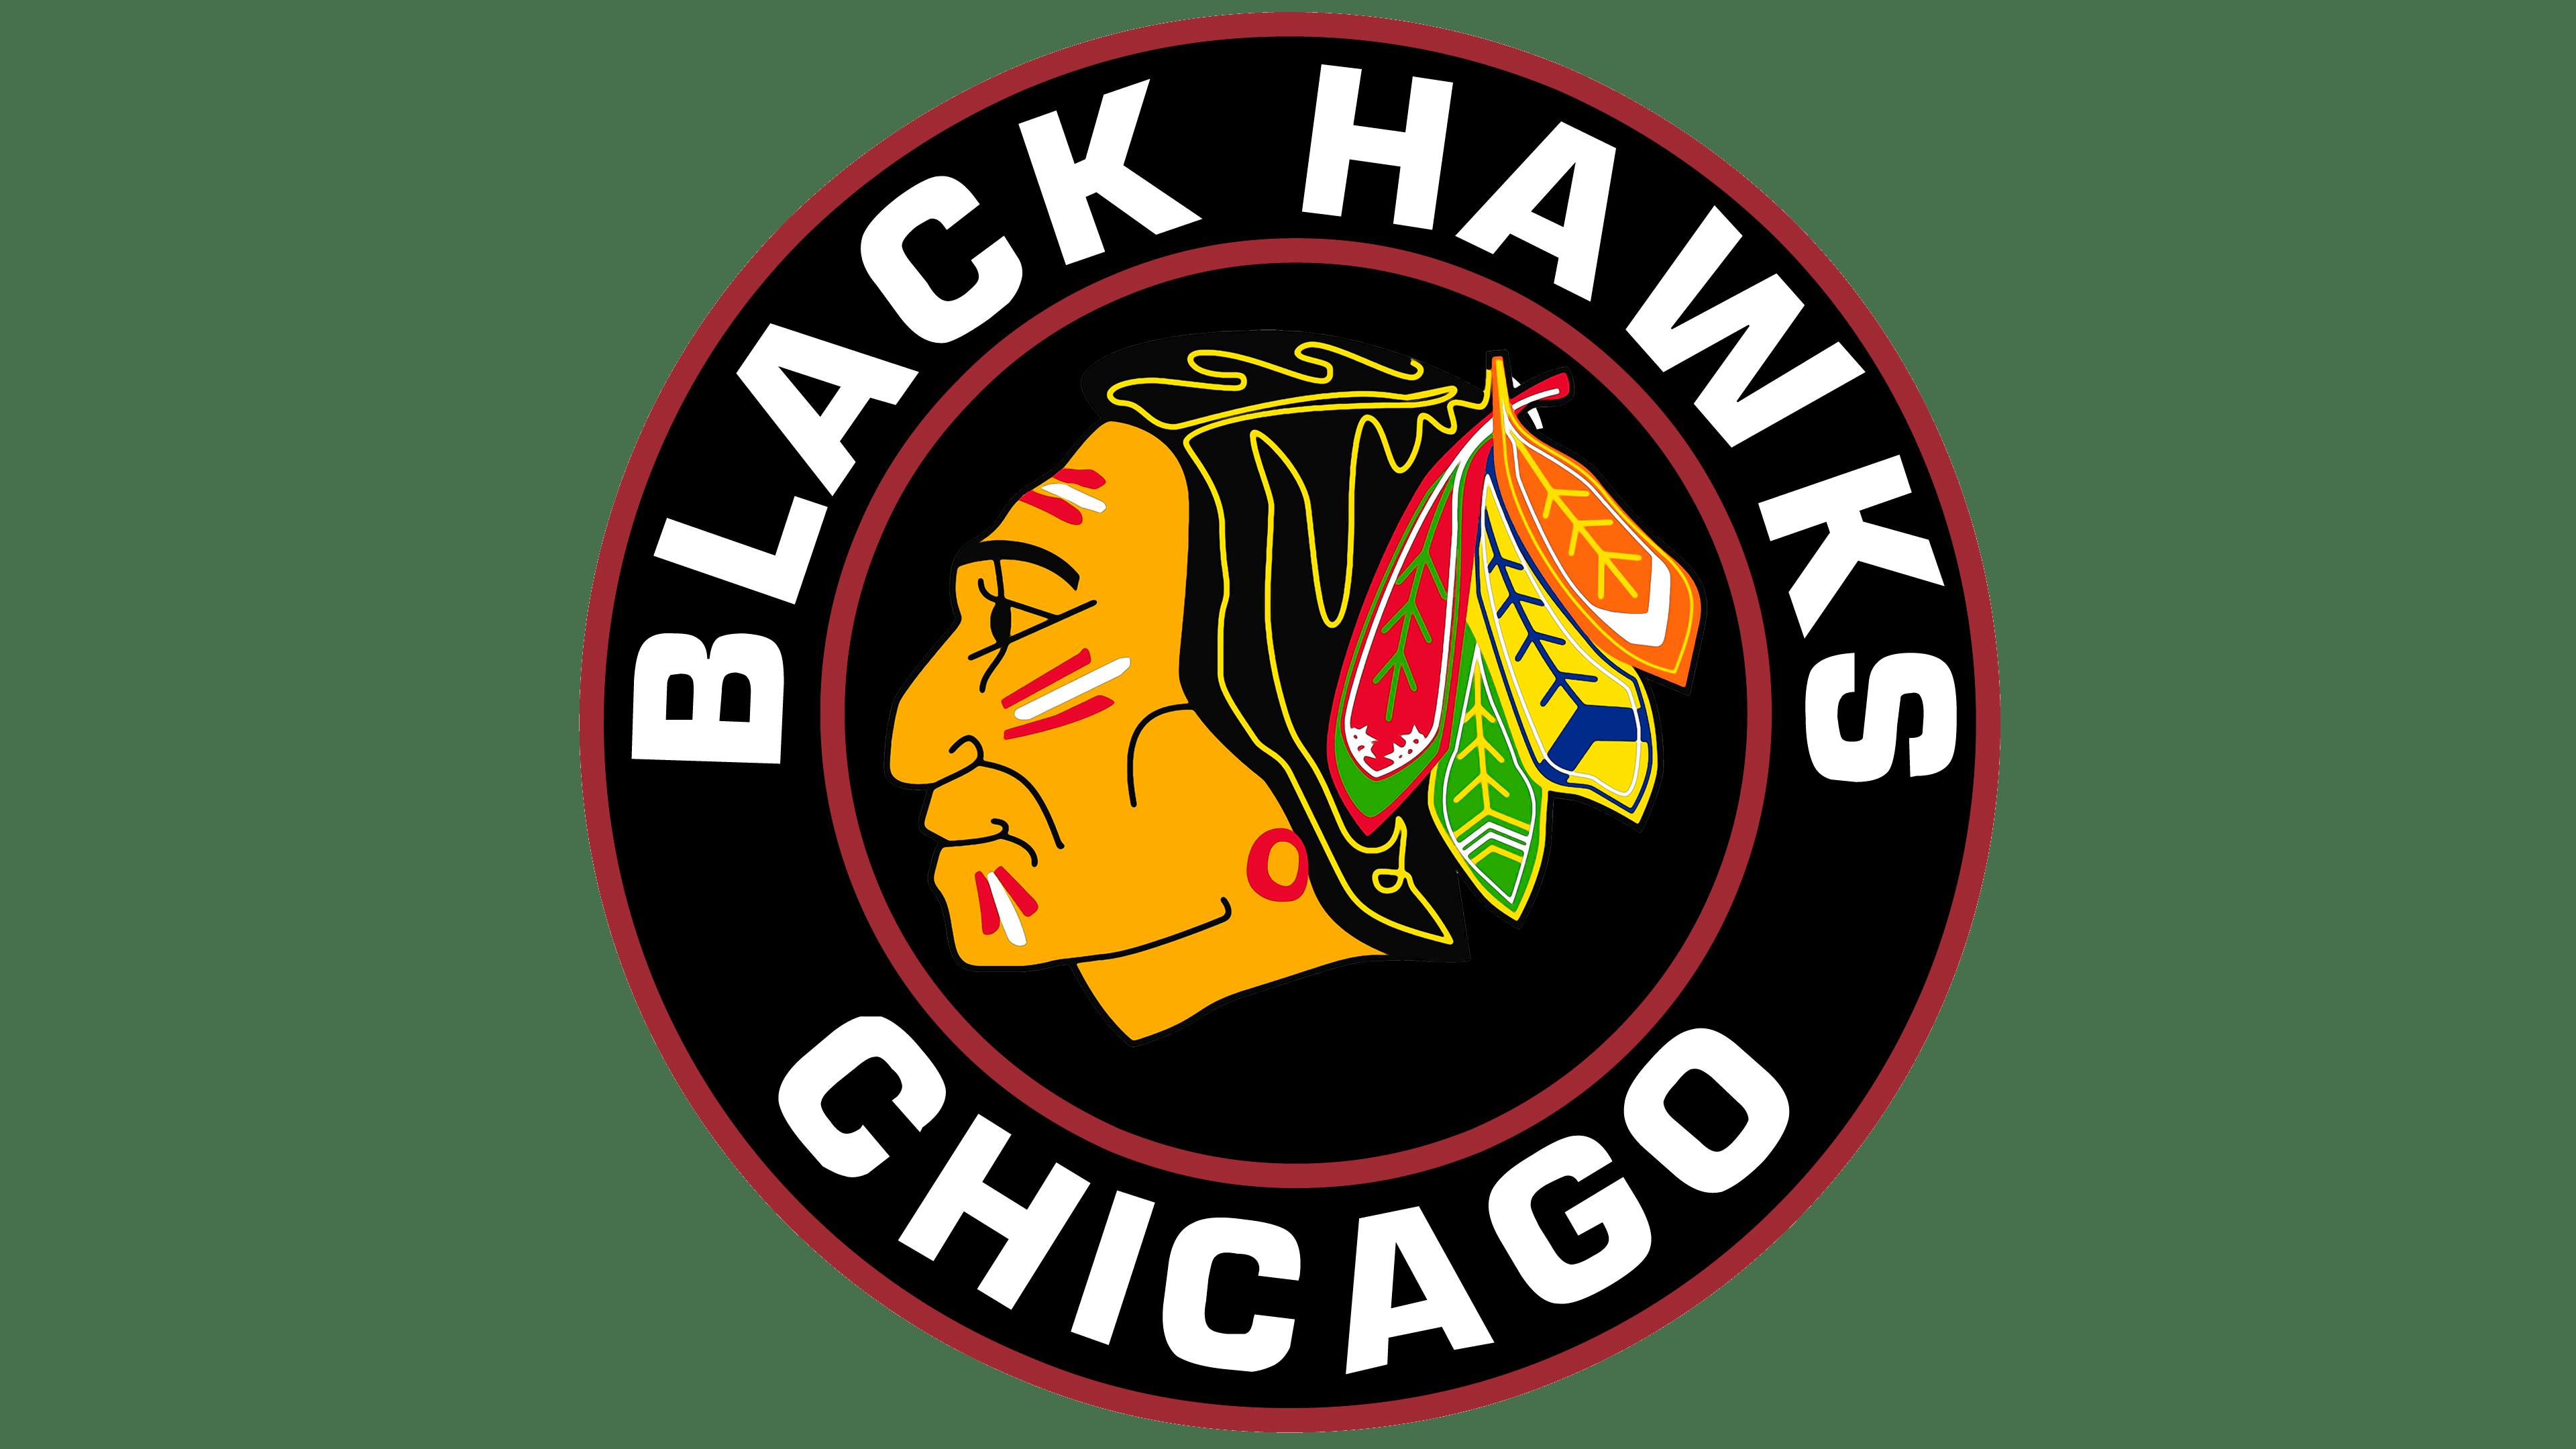 Chicago Blackhawks logos.